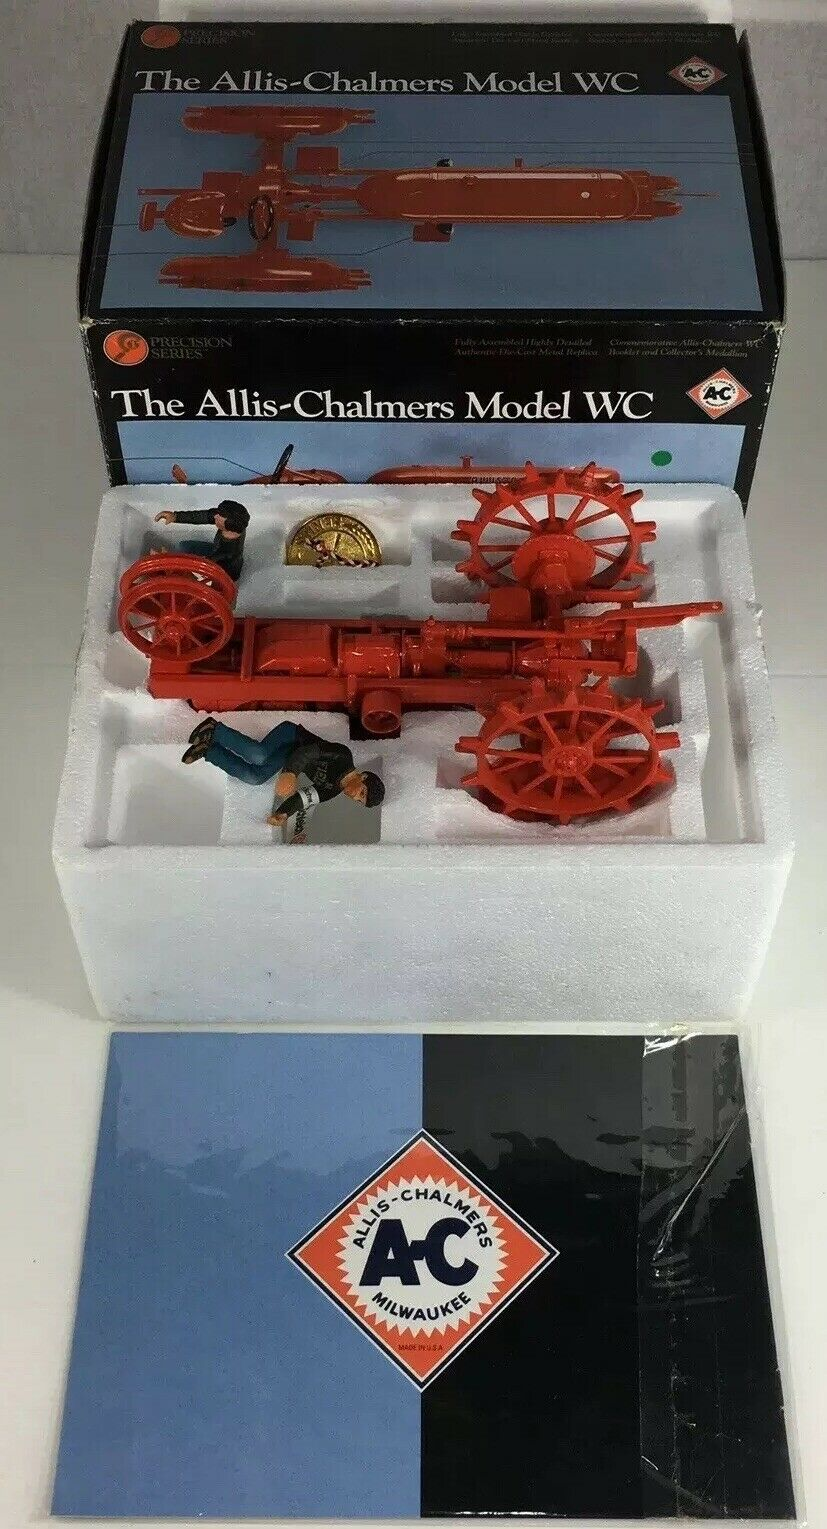 ERTL Precision Series The Allis-Chalmers Model WC No.2245 1 16 Scale Boxed